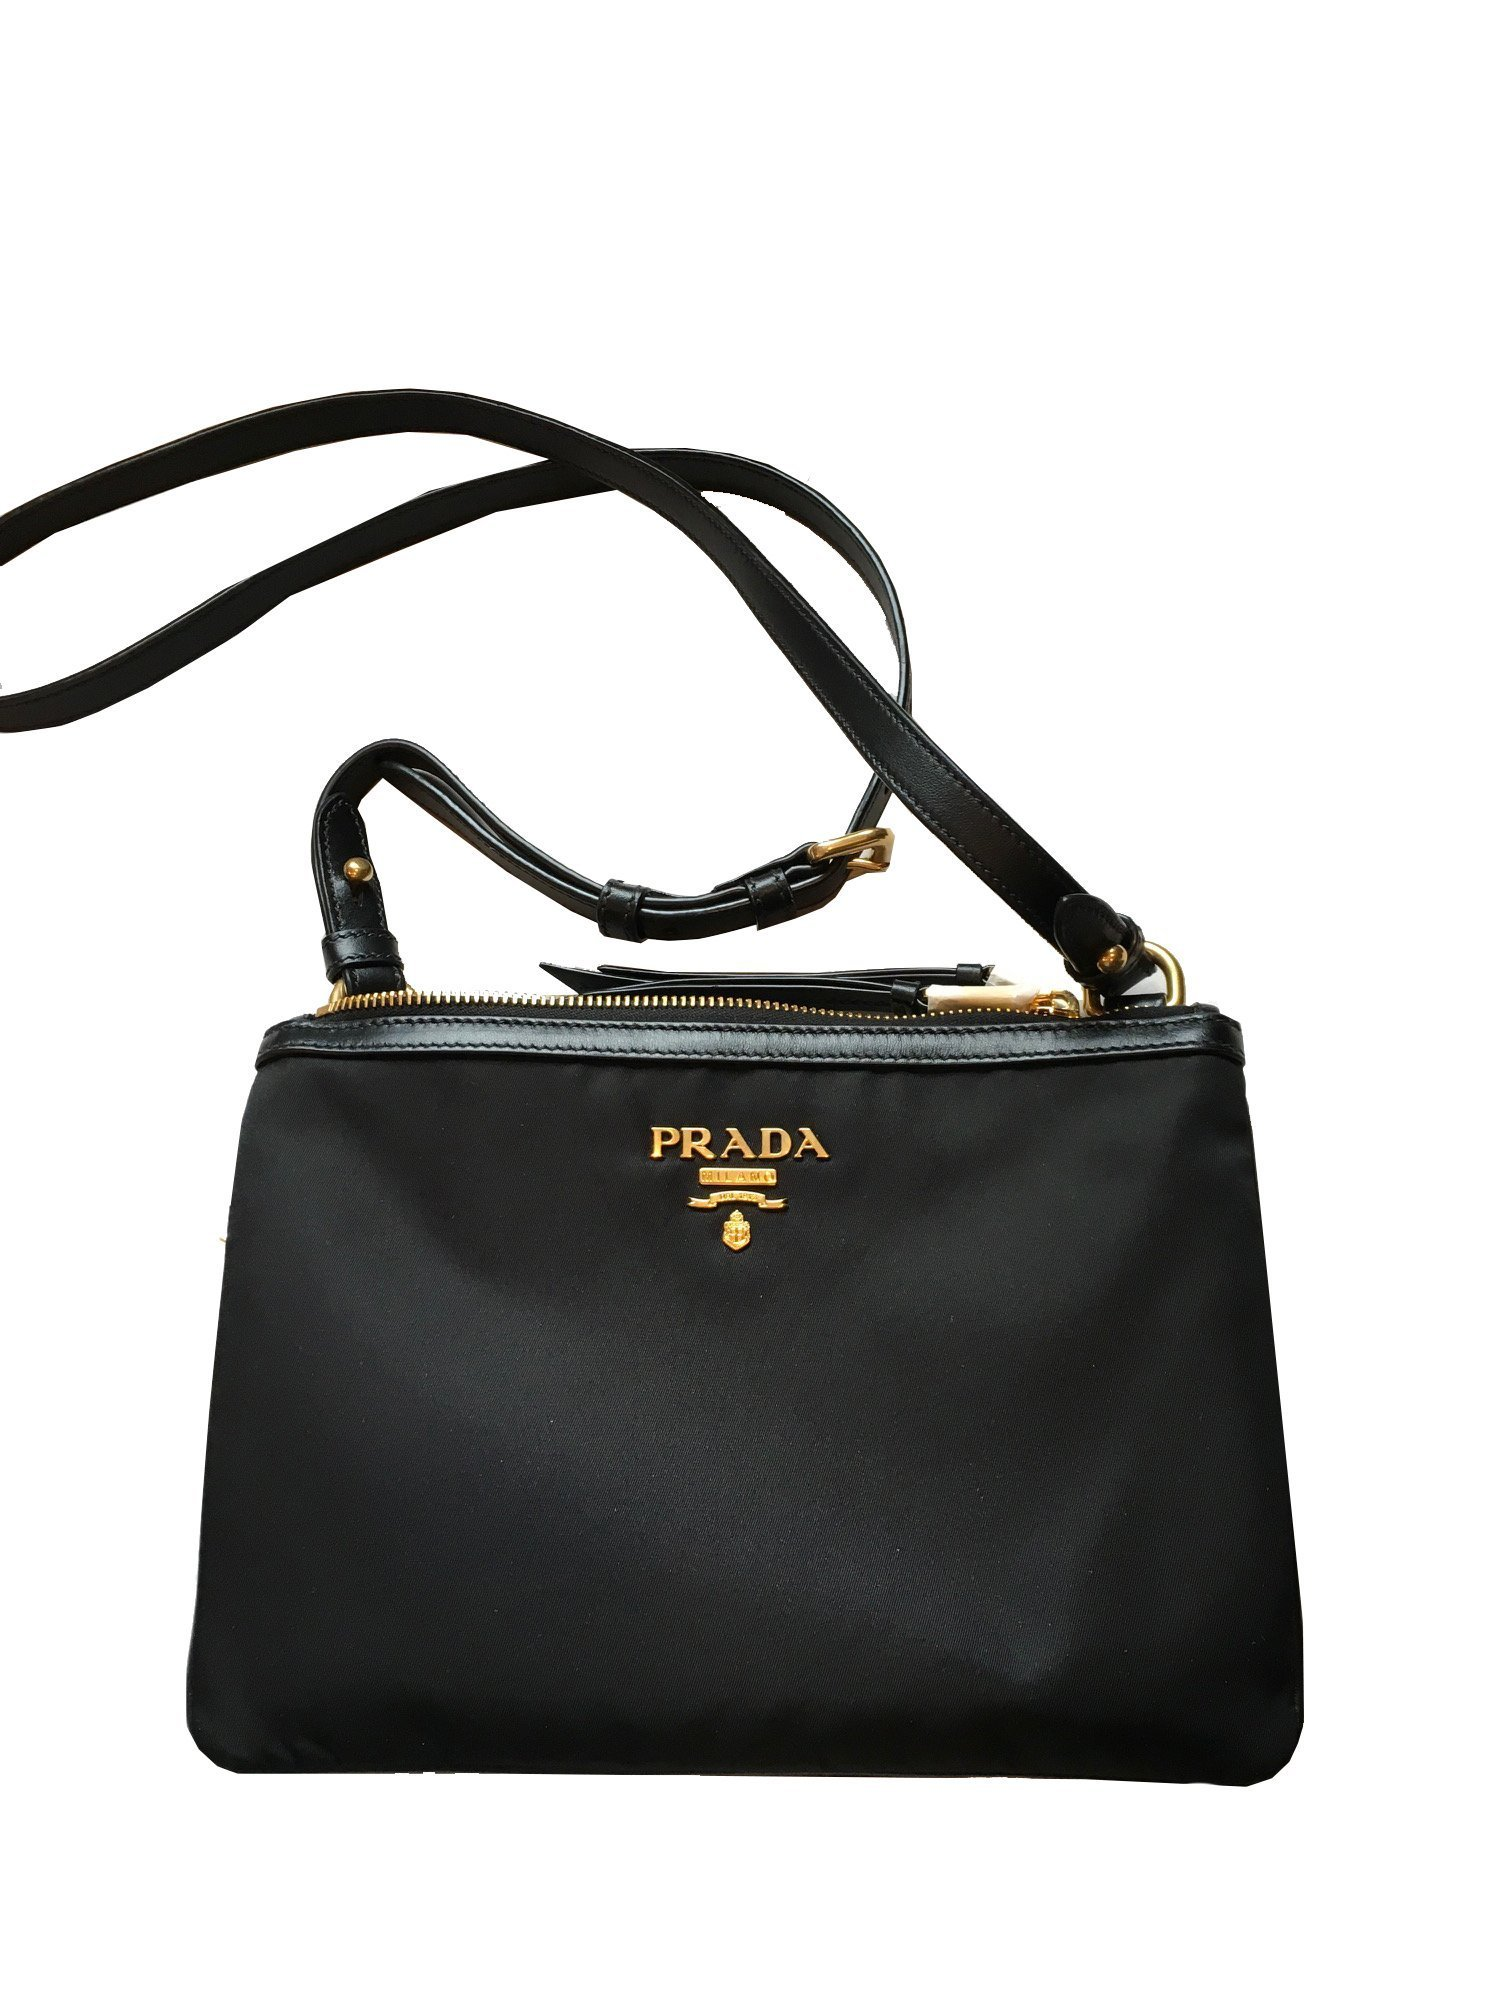 c37fbf90aa77e0 Prada Women's Black Tessuto Nylon Cross Body 1BH046 #Prada  #QueenBeeofBeverlyHills #BeverlyHills #Fendi #Designer #SaintLaurent  #DesignerHandbags #TomFord ...